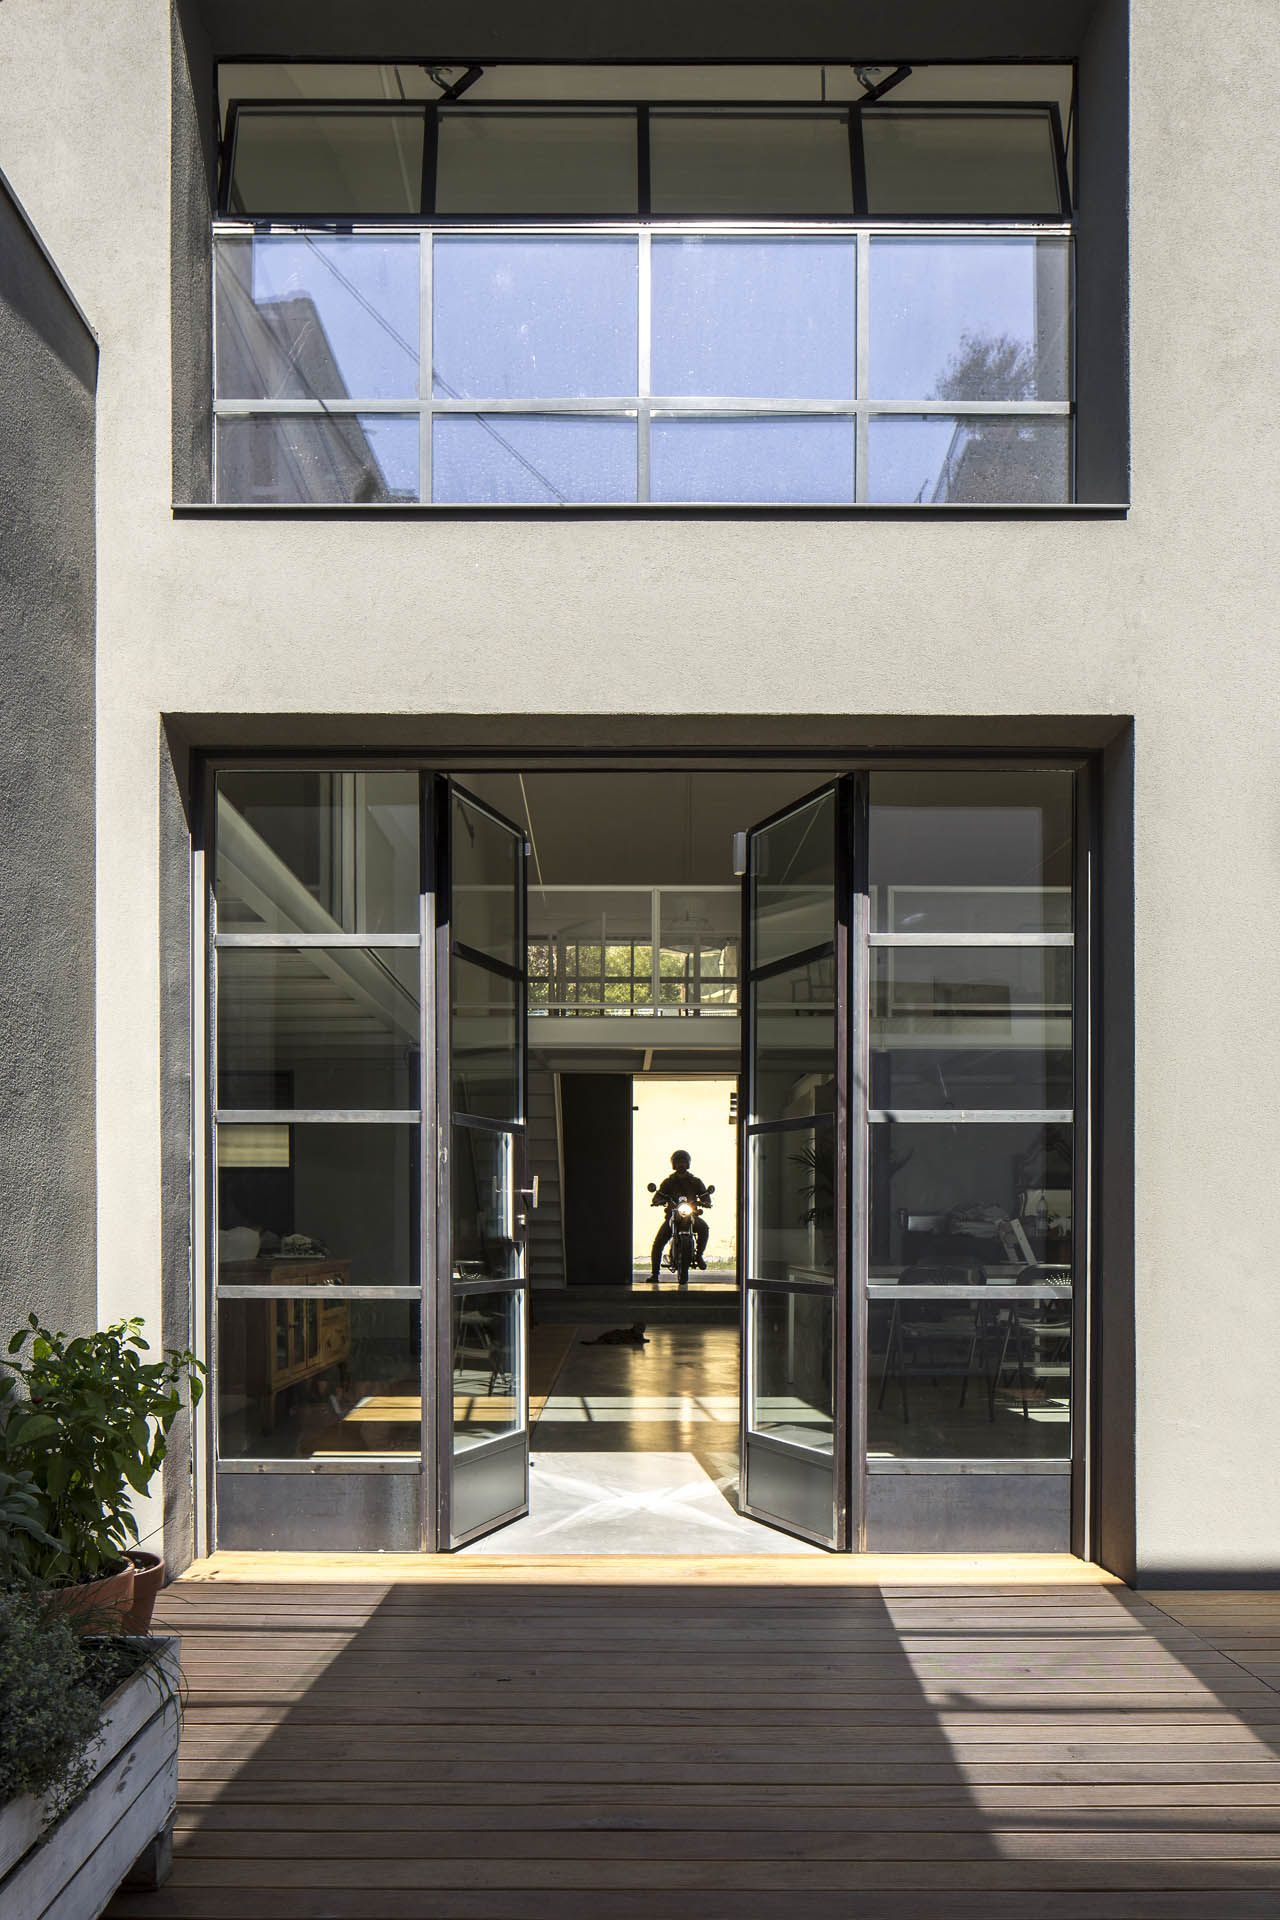 Mogs ferrofinestra architettura design loft bologna for Architettura in stile cottage